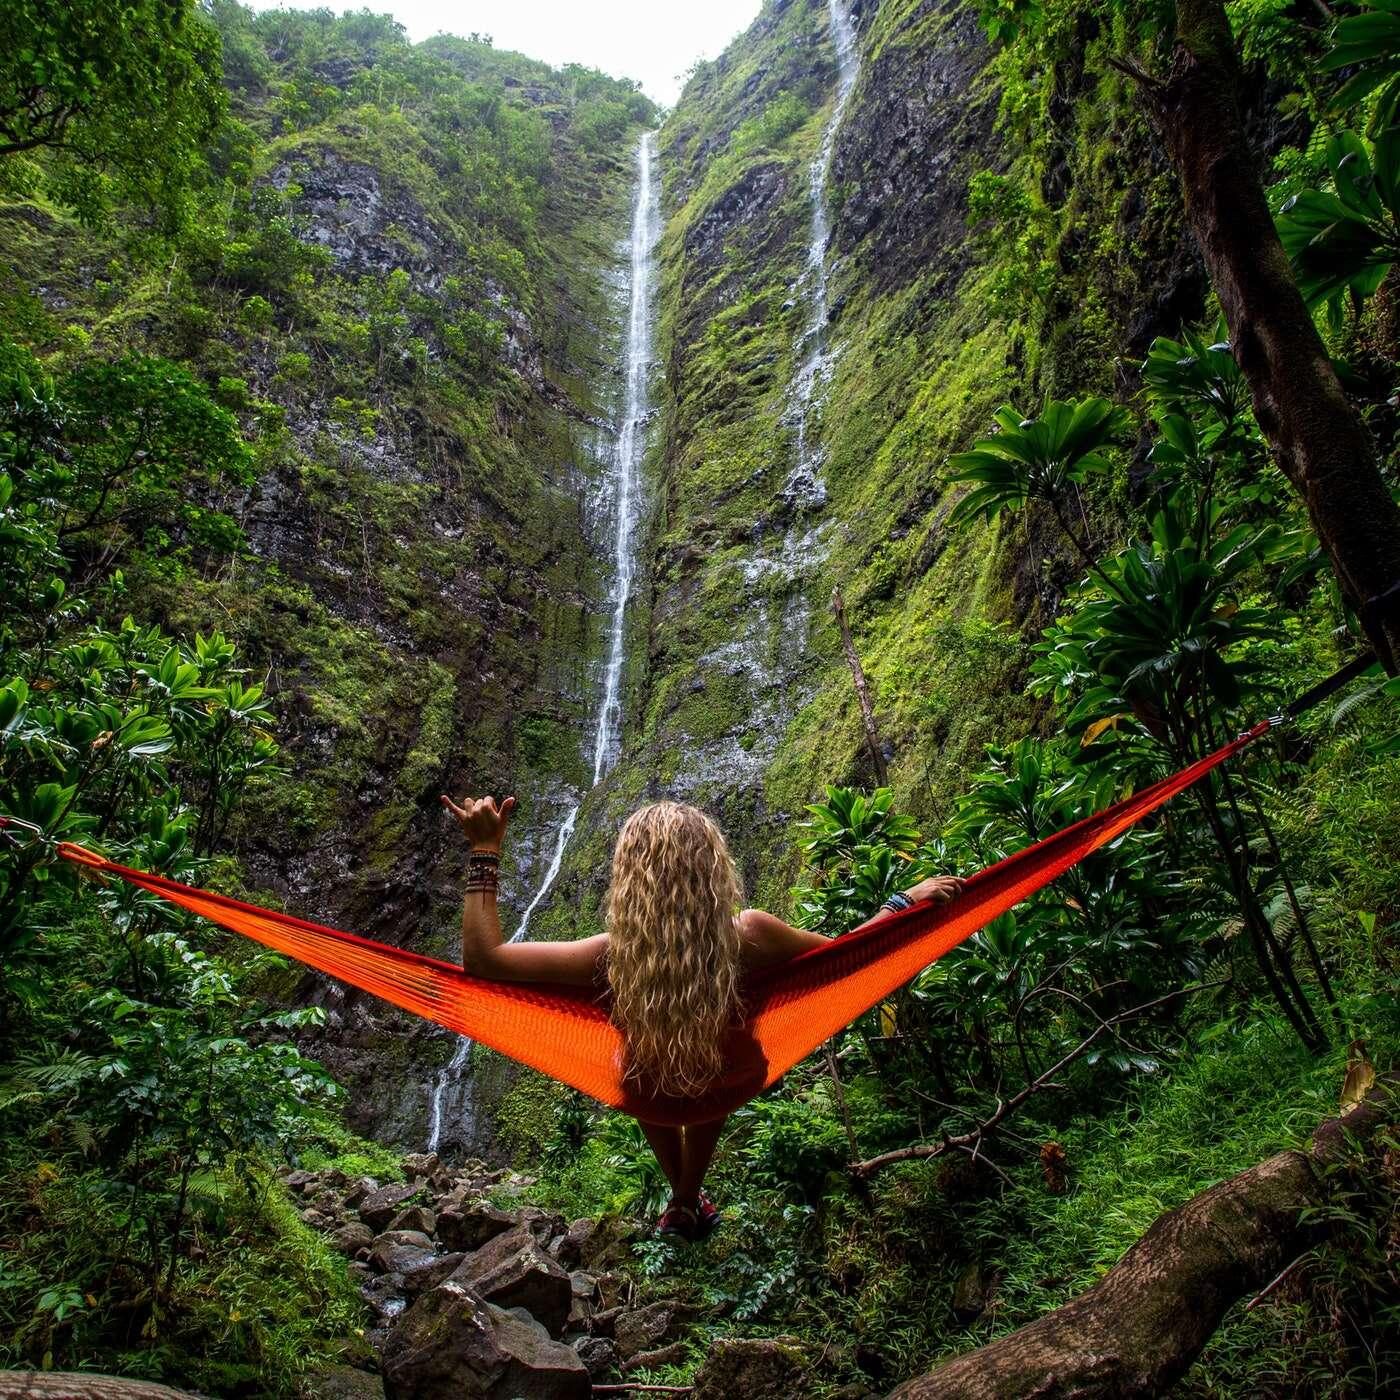 What Is Your Favorite Hawaiian Island?